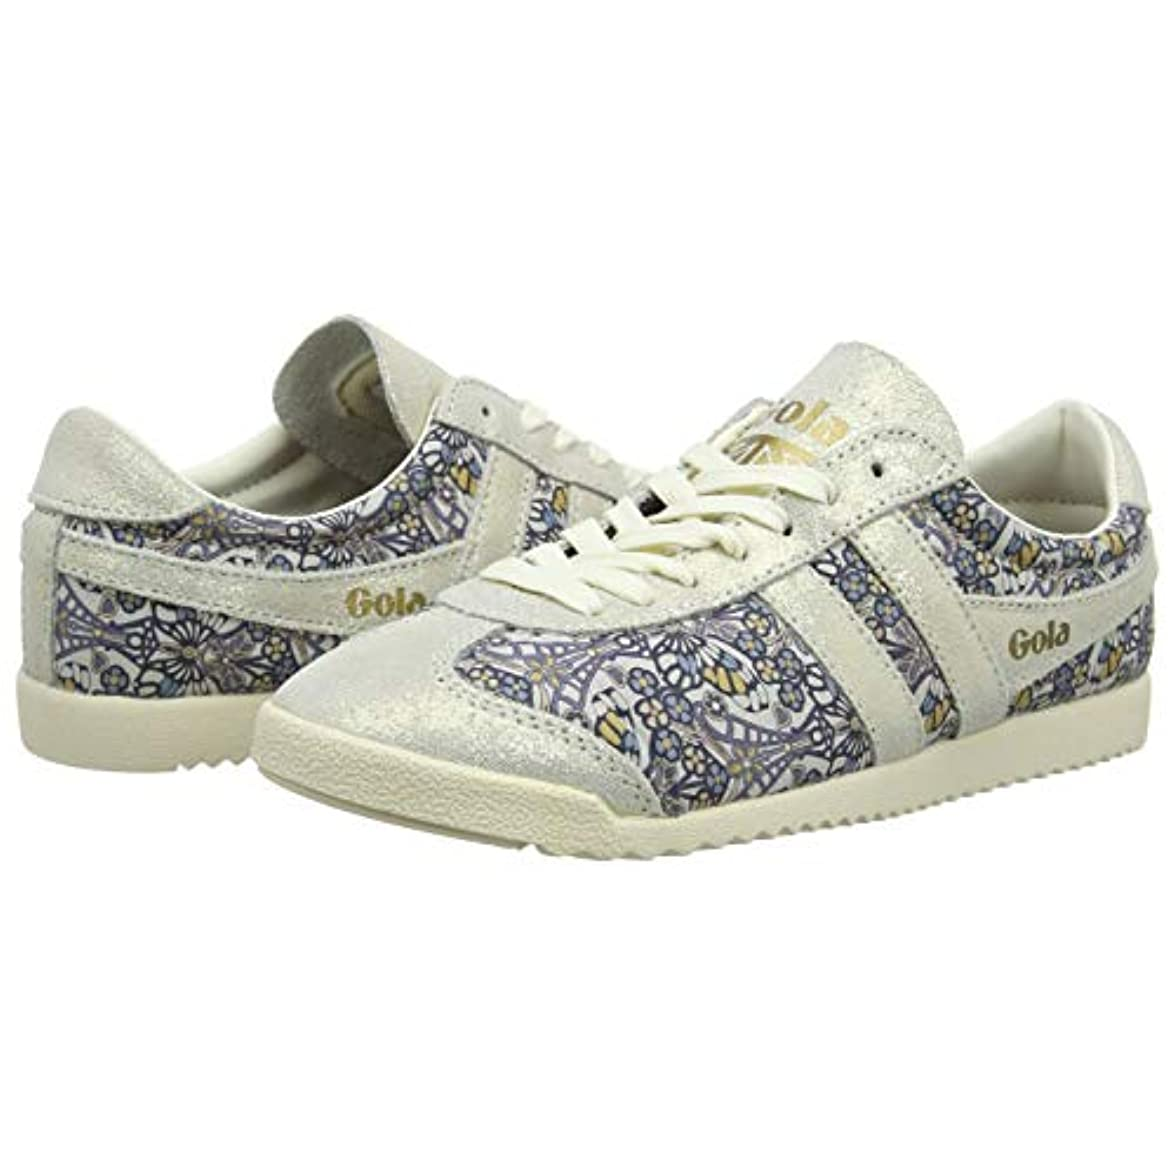 Gola Bullet Liberty Mb Sneaker Donna